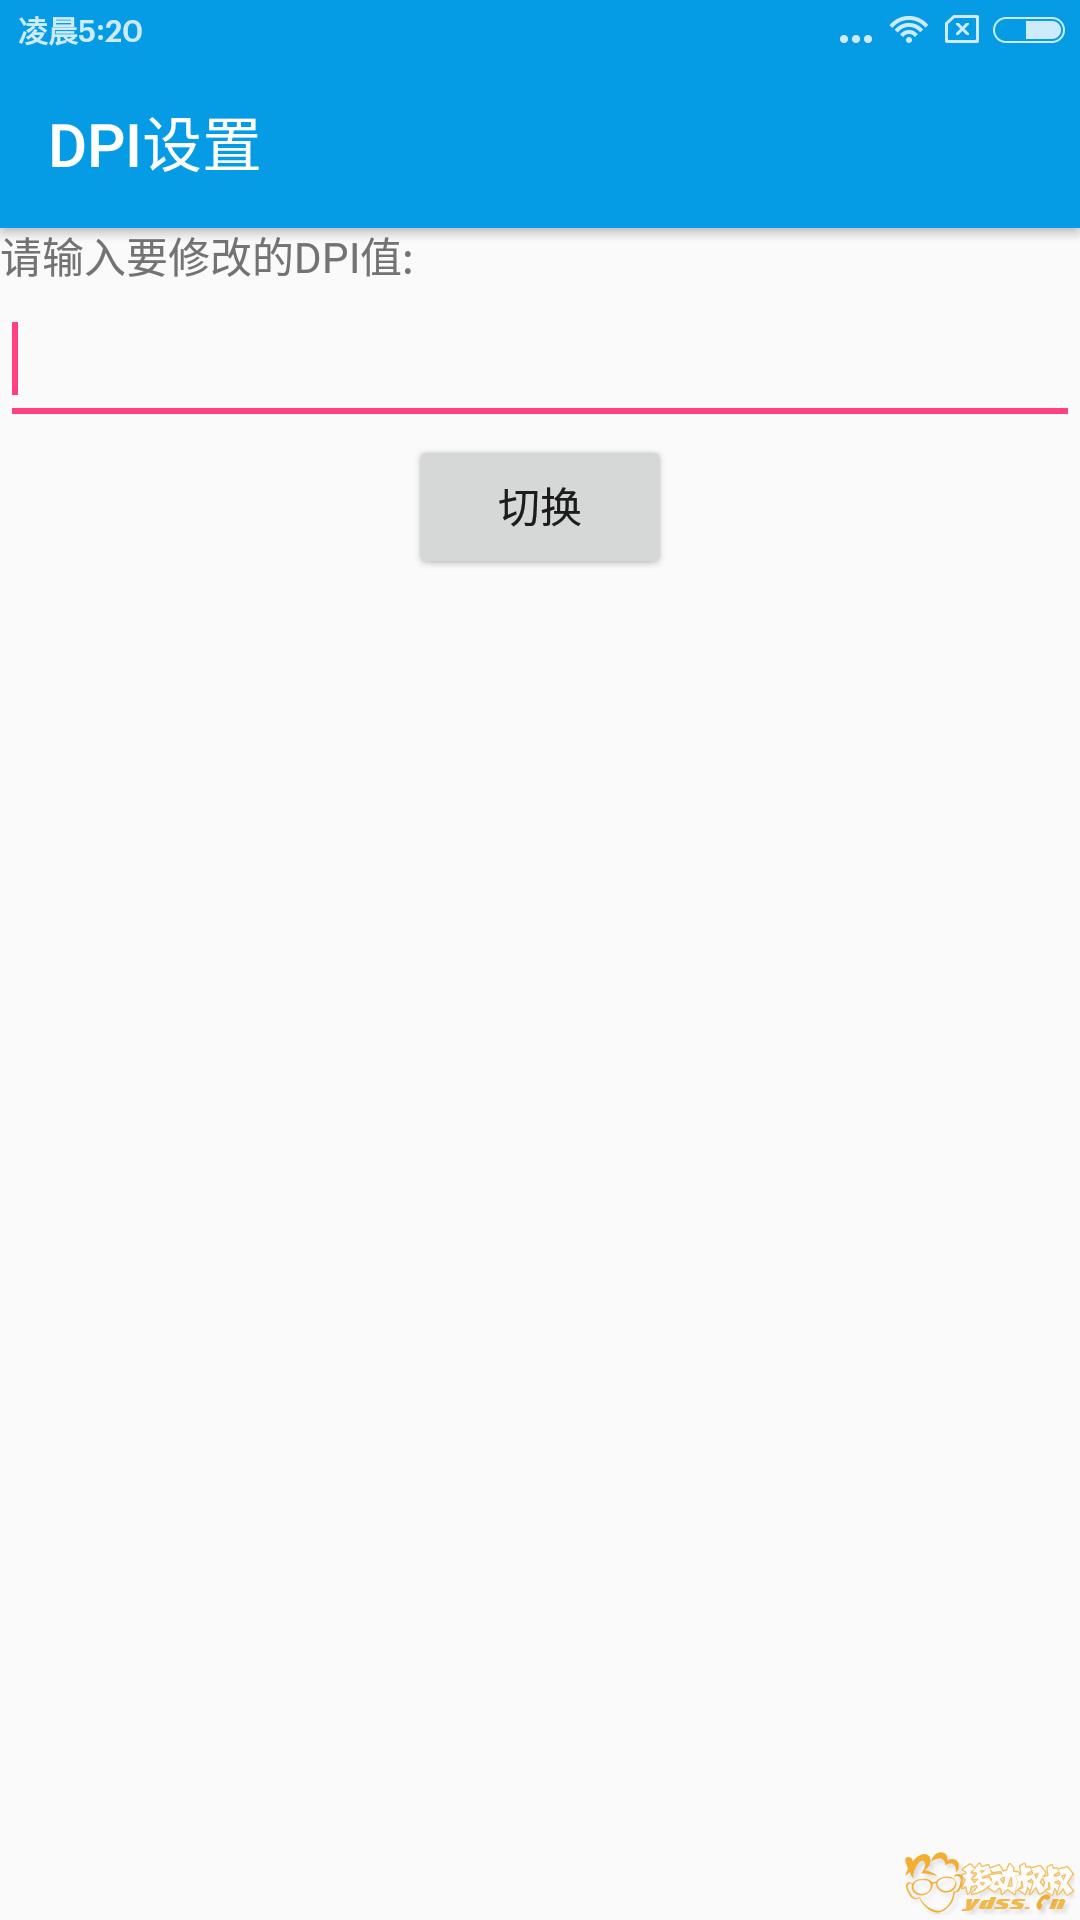 Screenshot_2018-02-12-05-20-22-095_com.example.dh.png